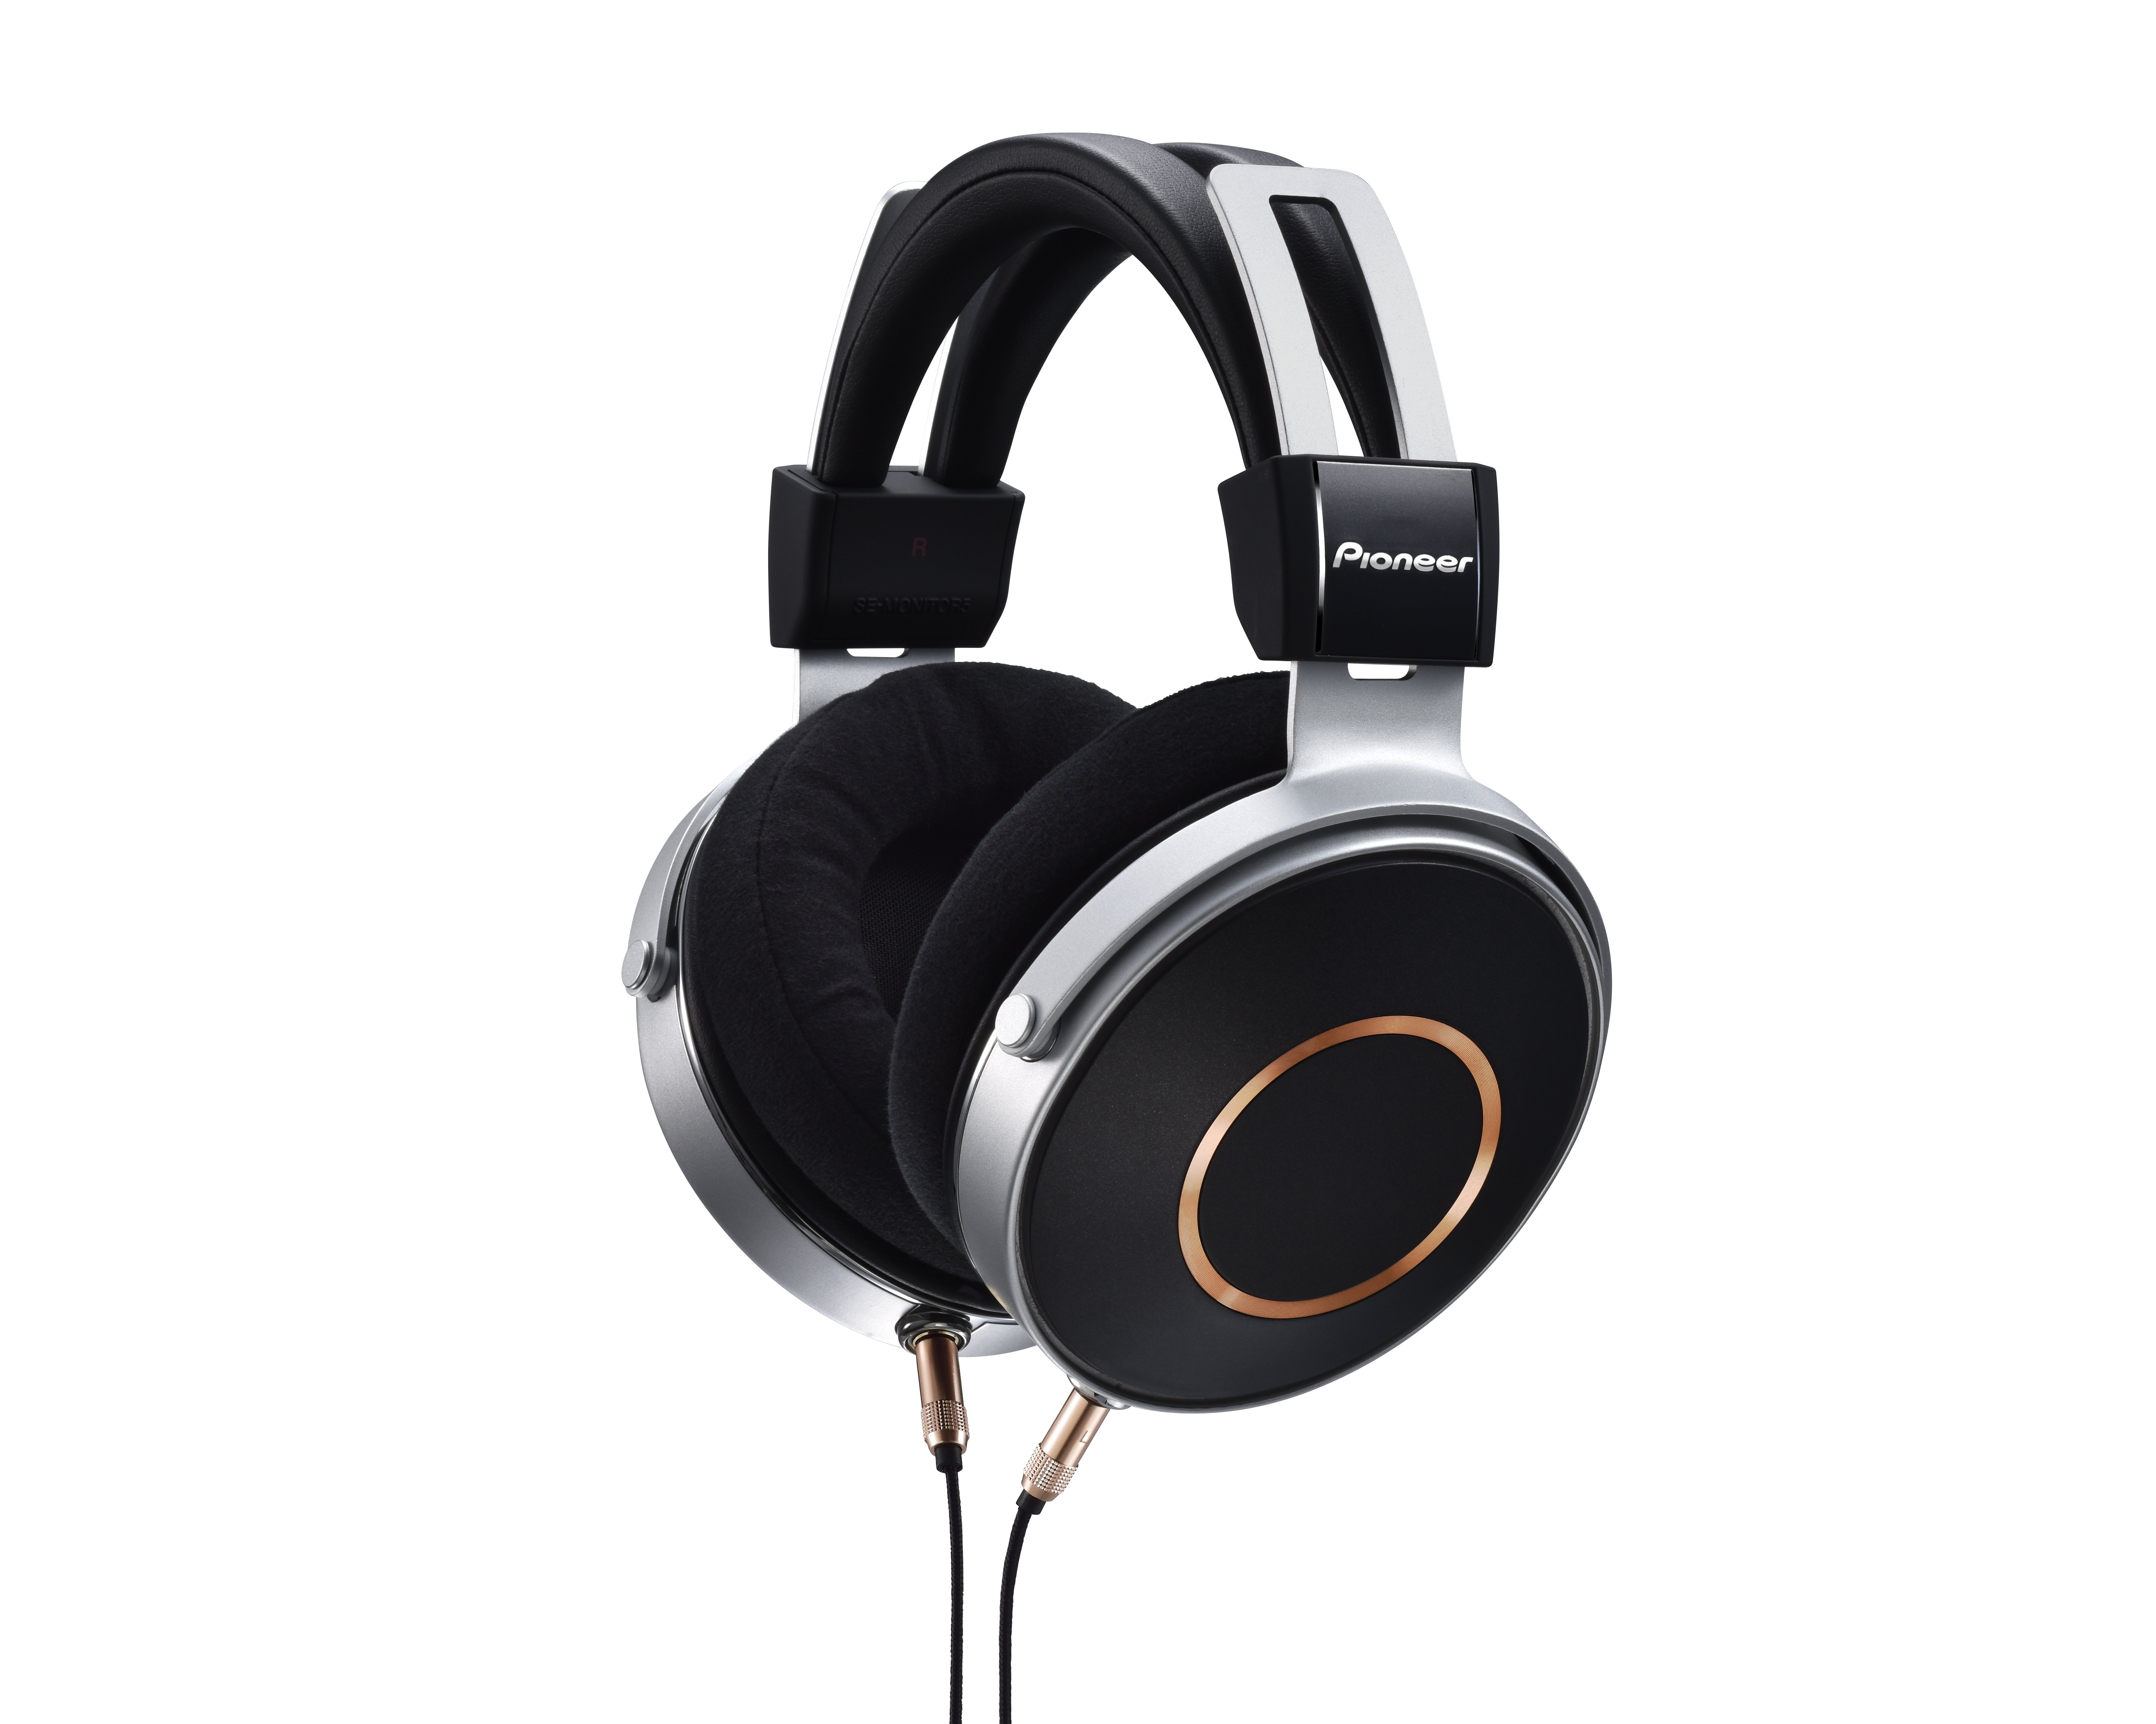 Pioneer 在台推出全新封閉高階耳機 SE-Monitor 5 ,繼承經典耳機 Monitor 10 精神